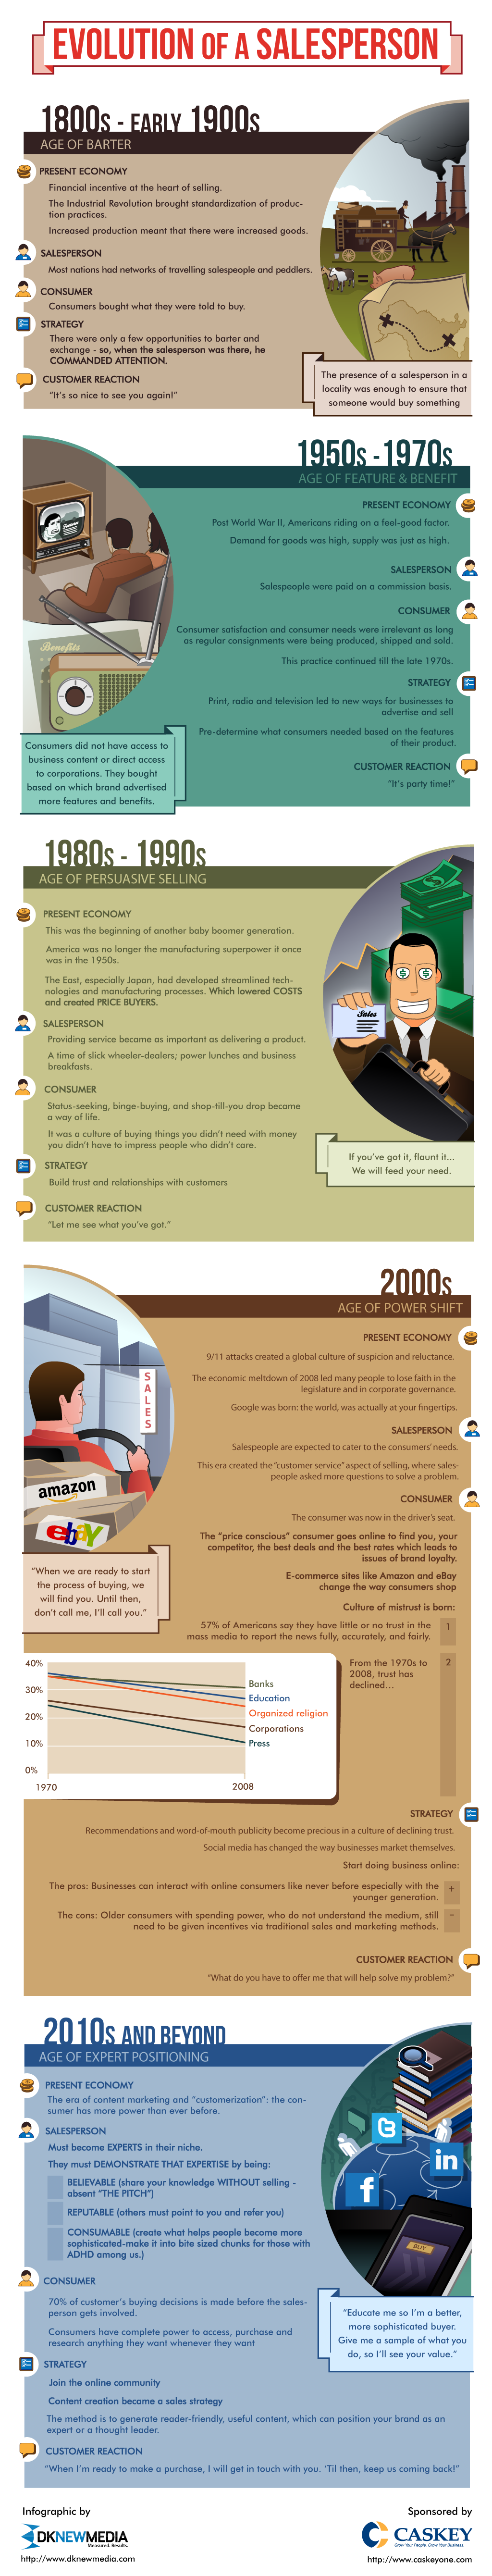 Evolution of a Salesperson